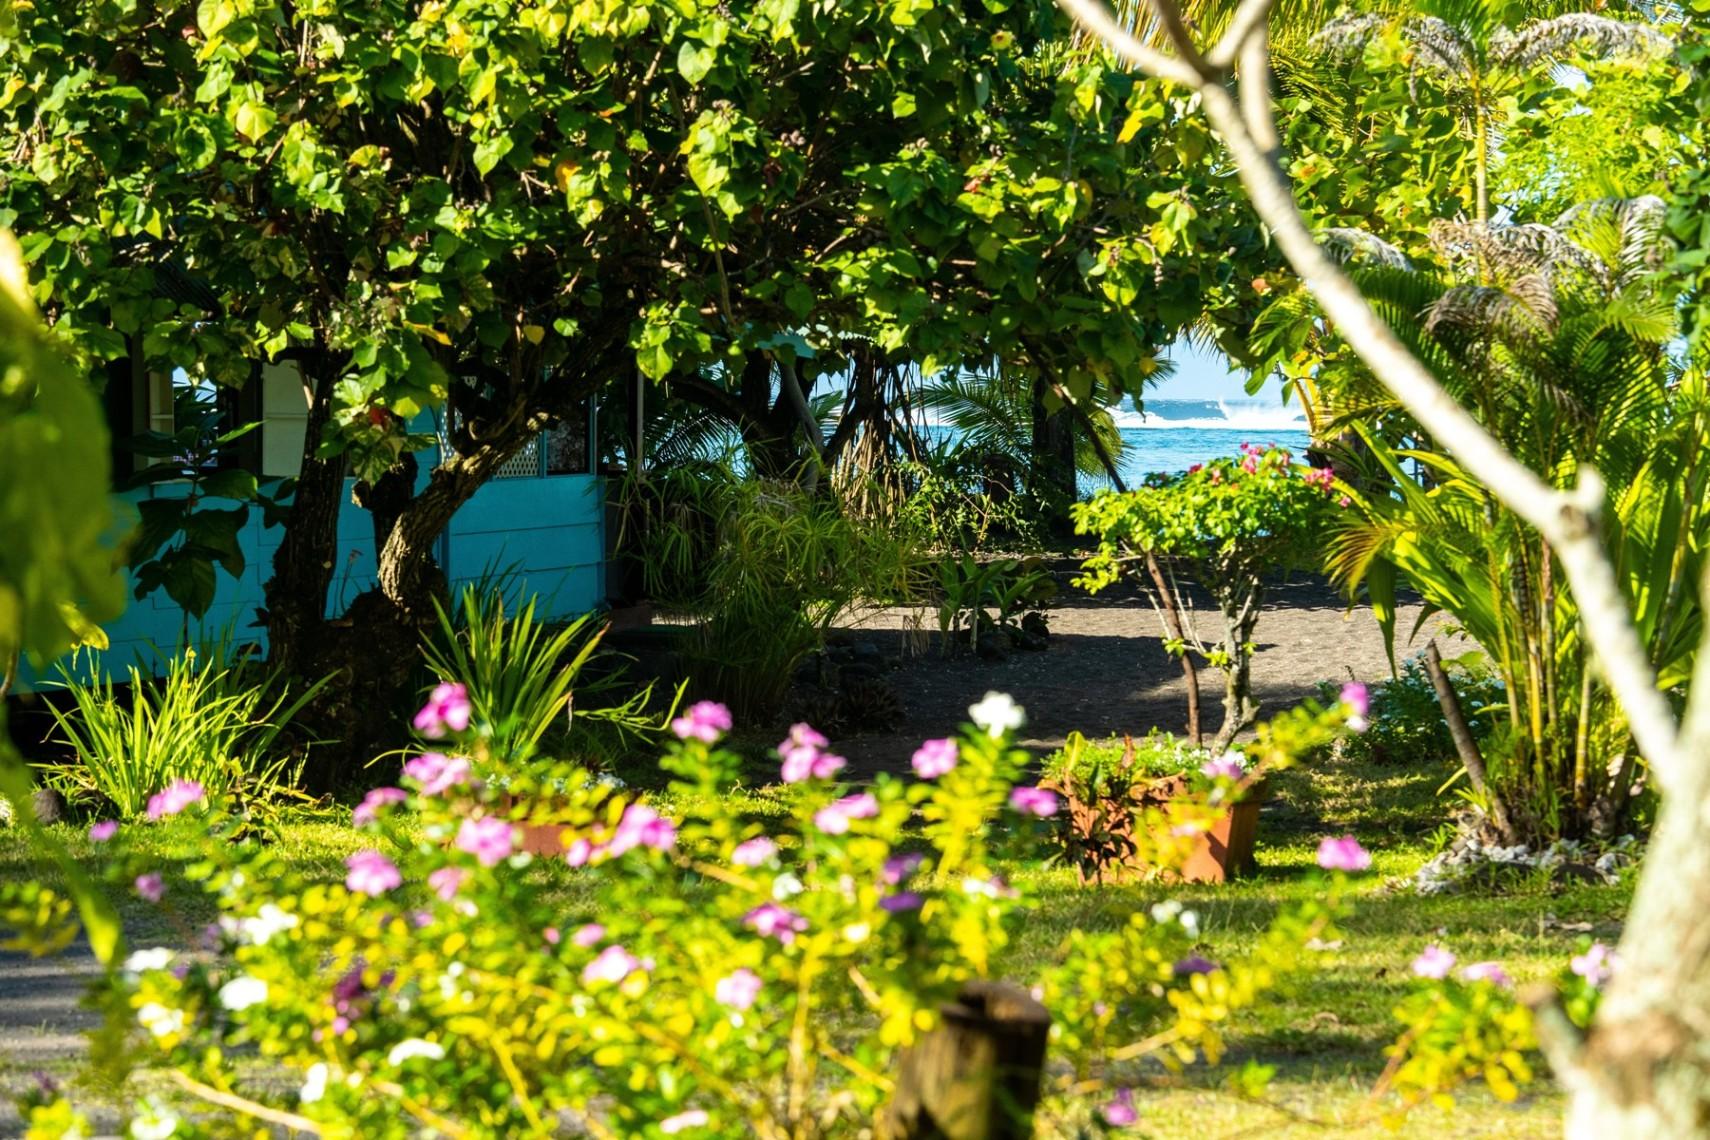 https://tahititourisme.de/wp-content/uploads/2019/08/copie-tahiti-tourisme-800ko-1.jpg